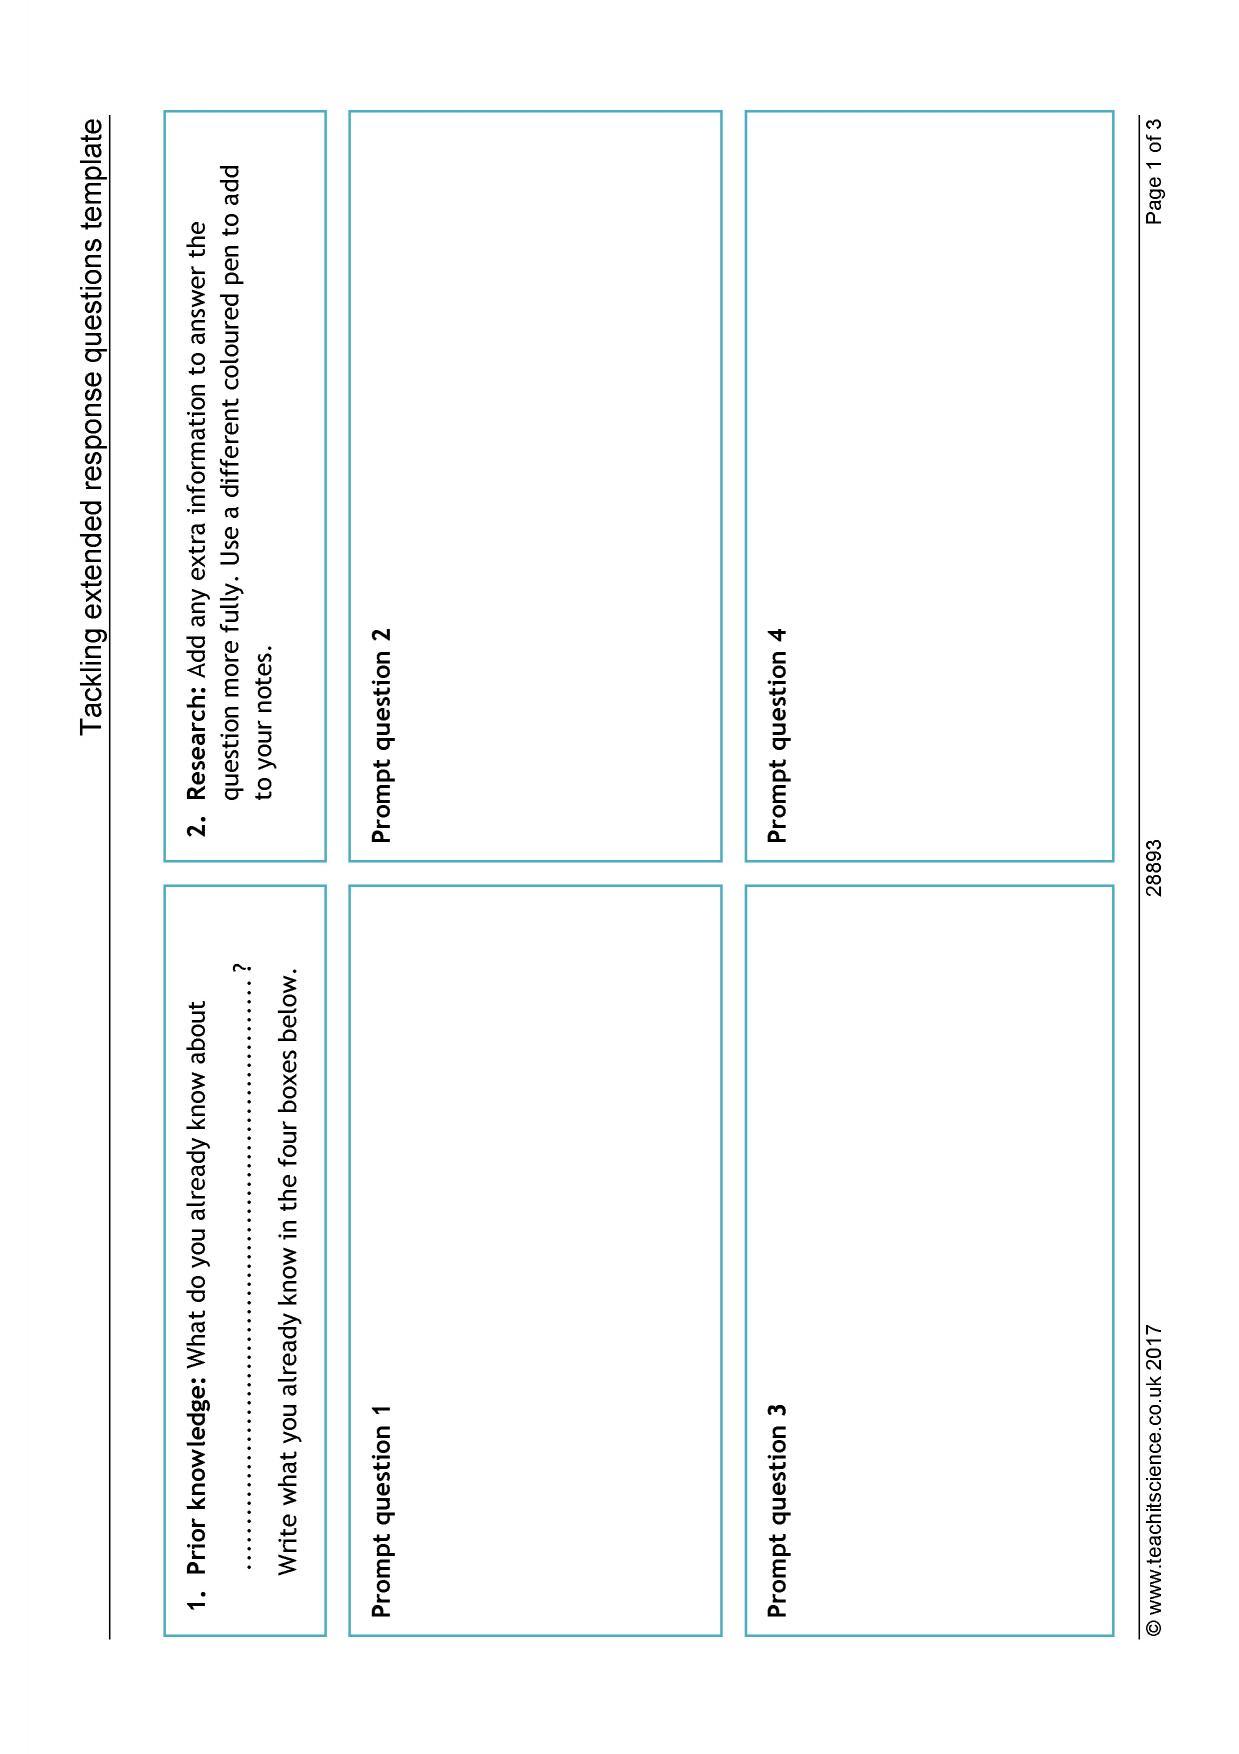 Ks4 Biology Teaching Resources Printable Worksheets And